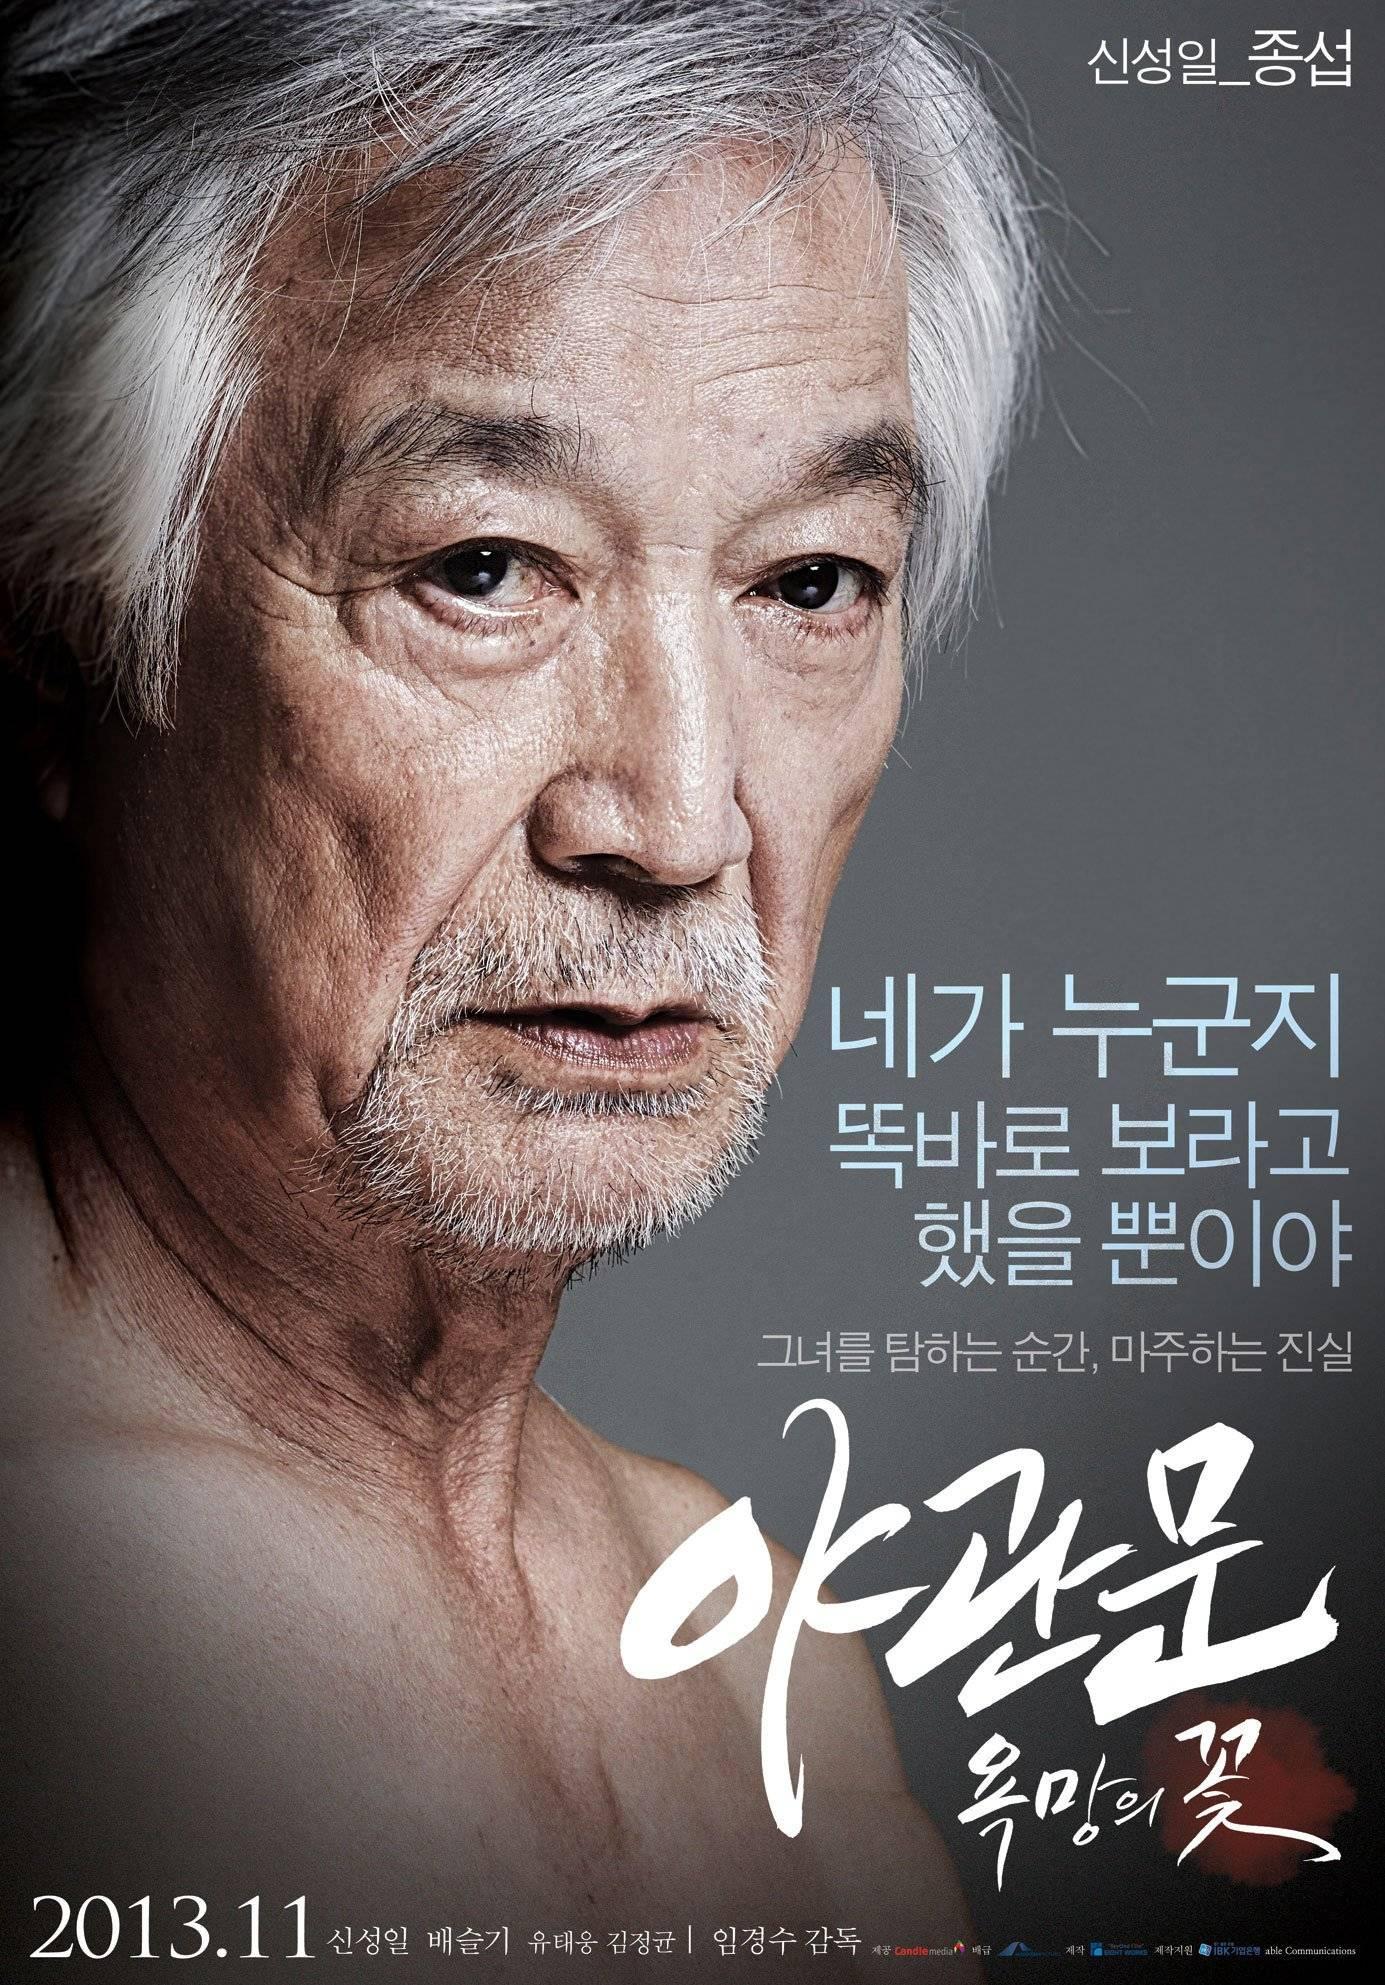 Korean Movie 야관문 욕망의 꽃 Door To The Night, 2013 예고편 Trailer - YouTube